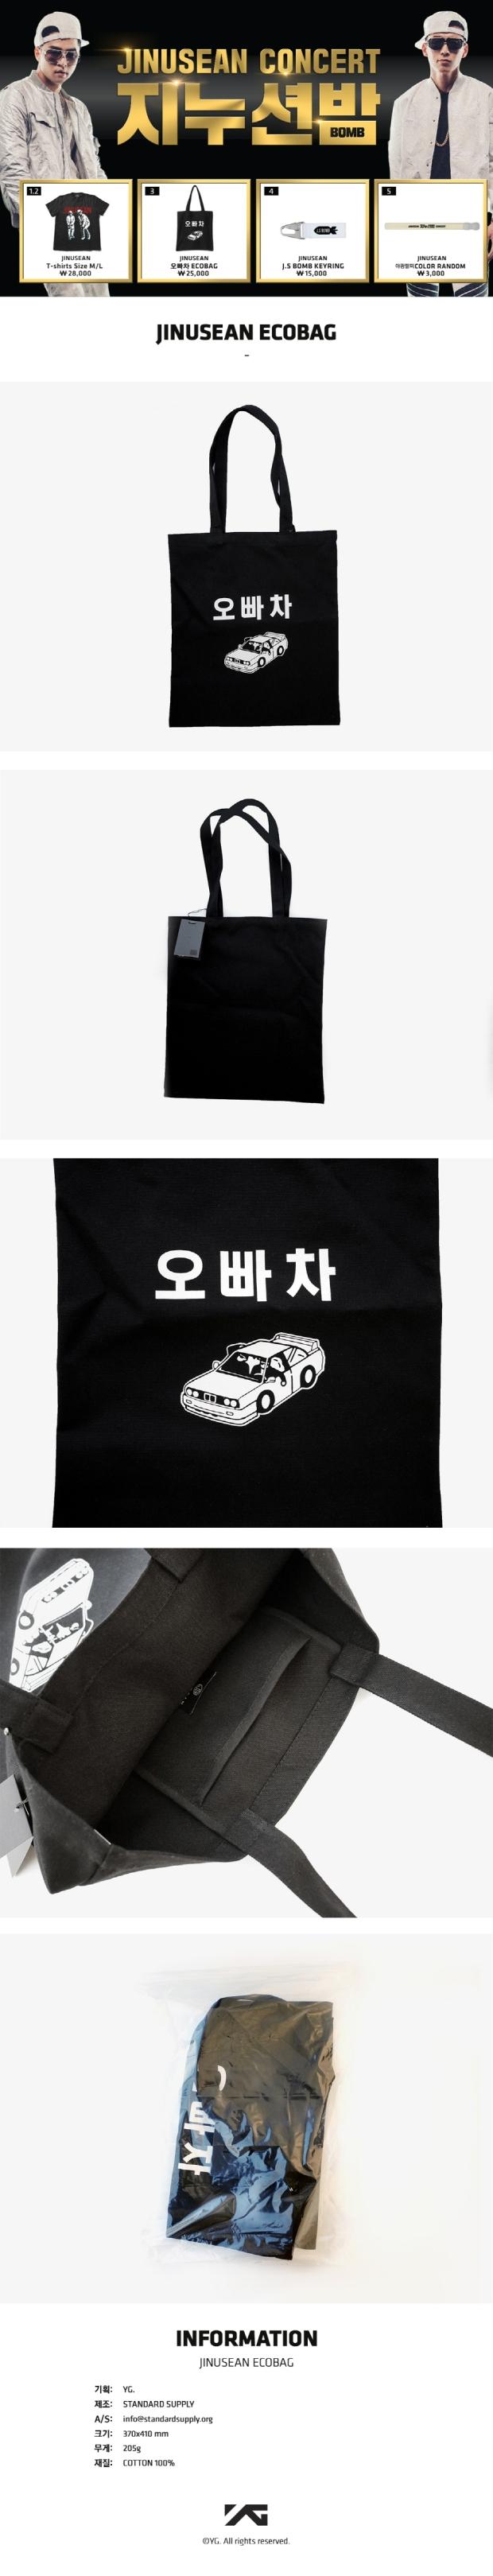 02_jinusean-ecobag_01